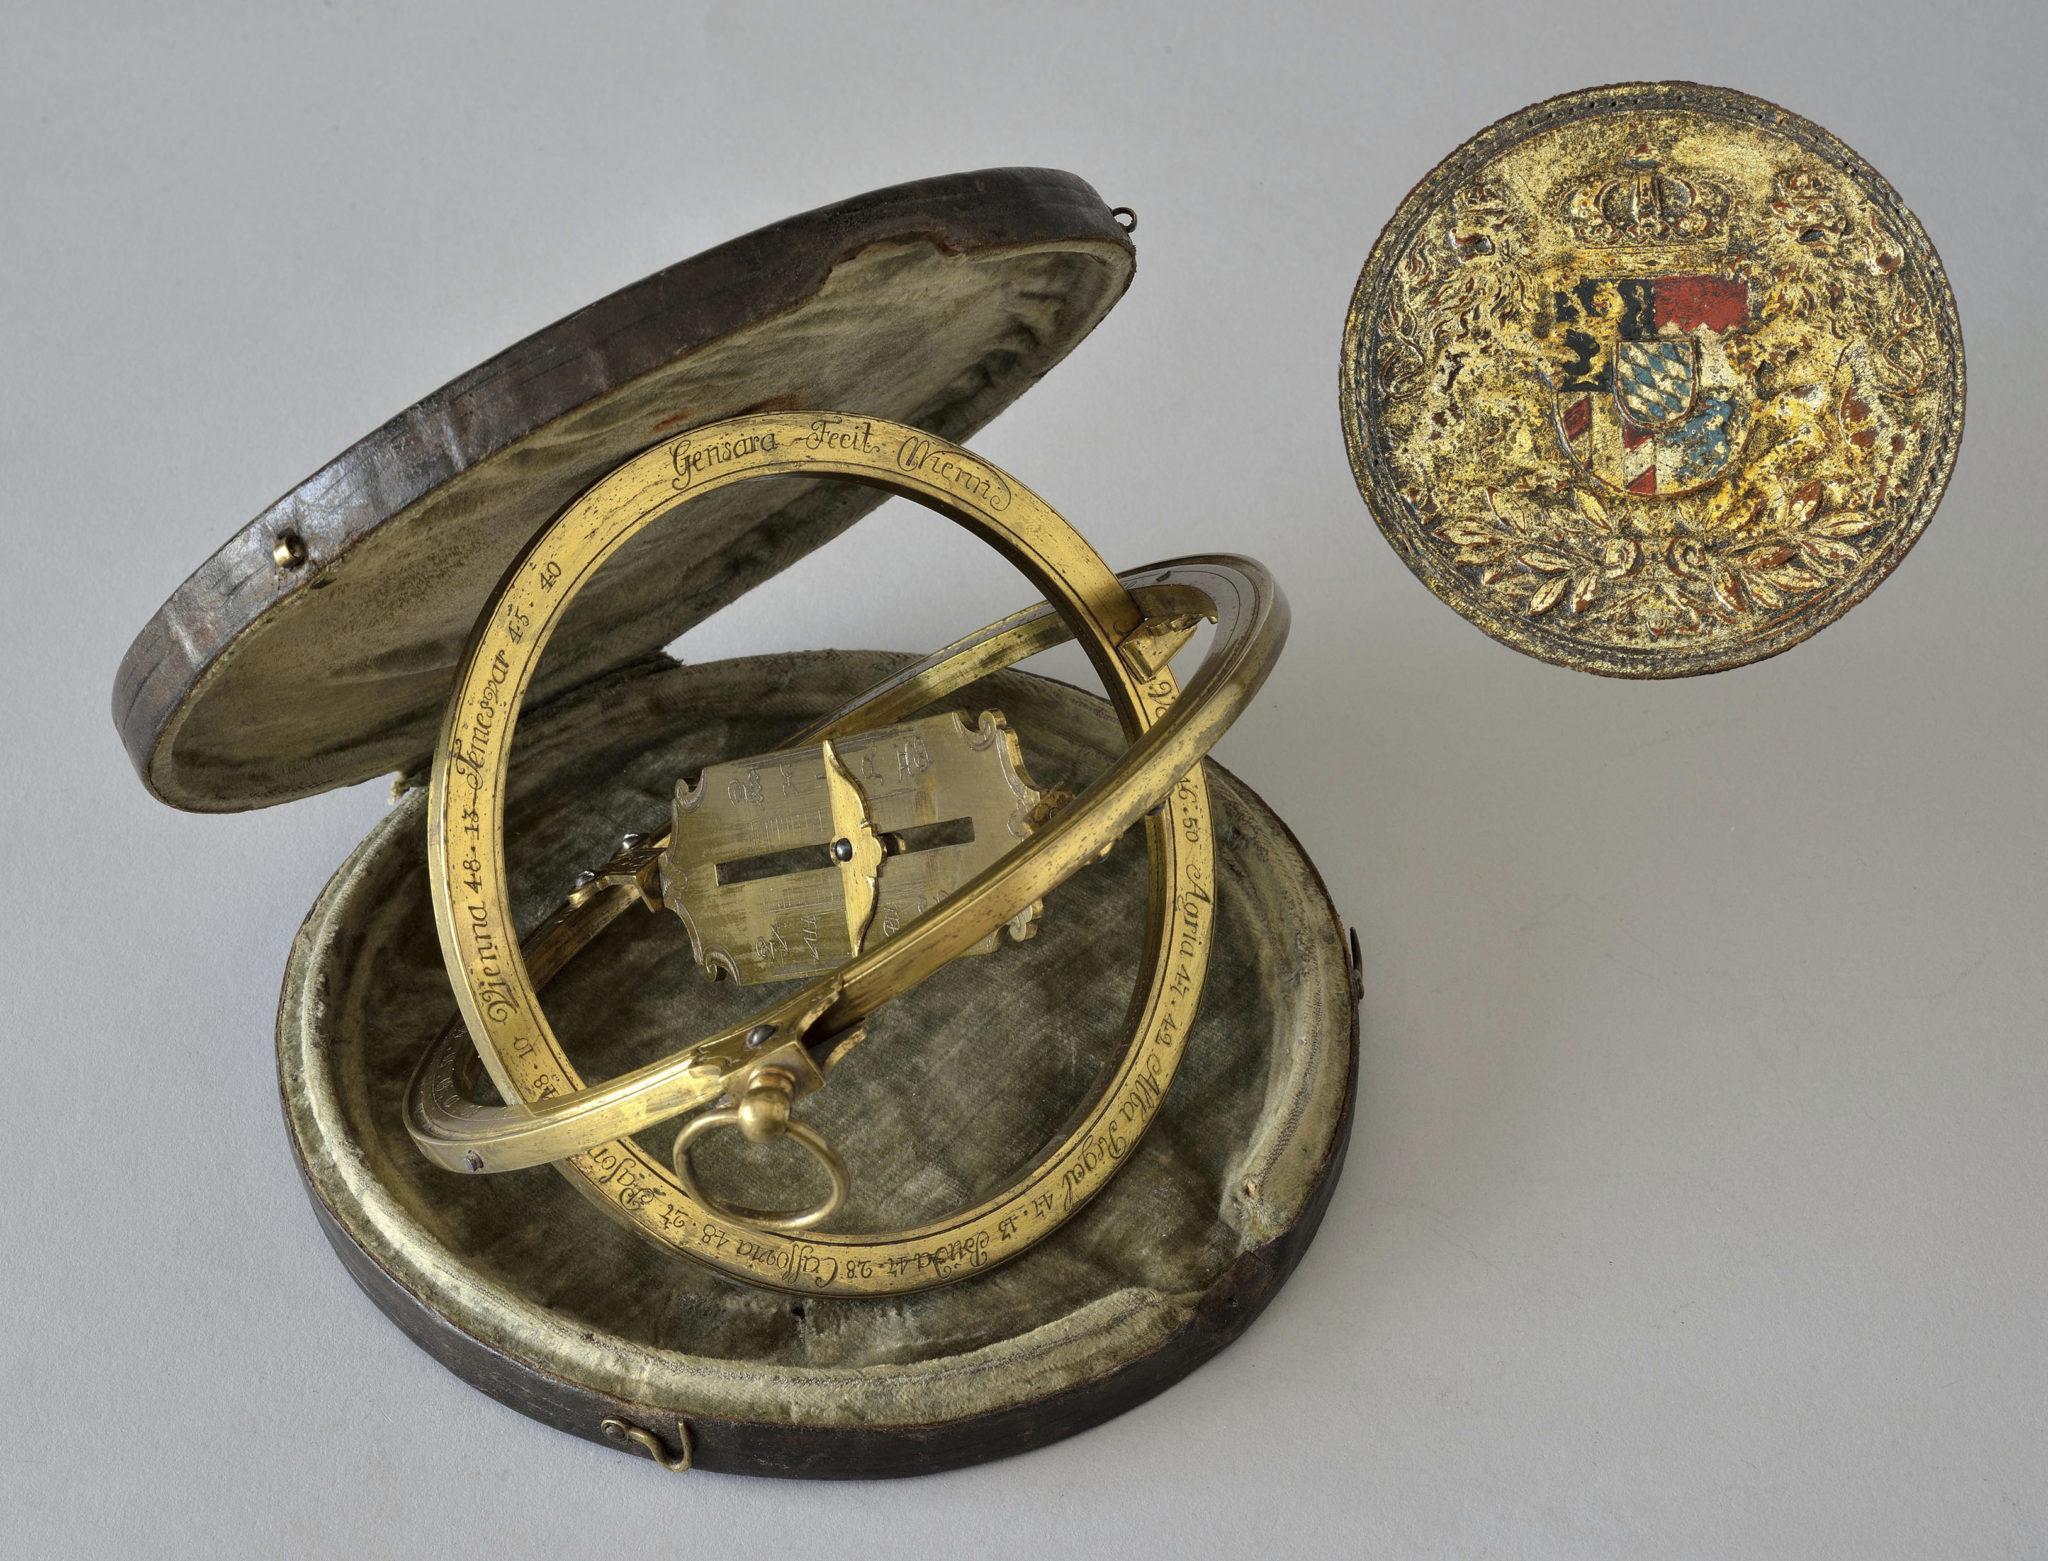 Equatorial universal ring dial in brass signed Gensara Fecit Wienn